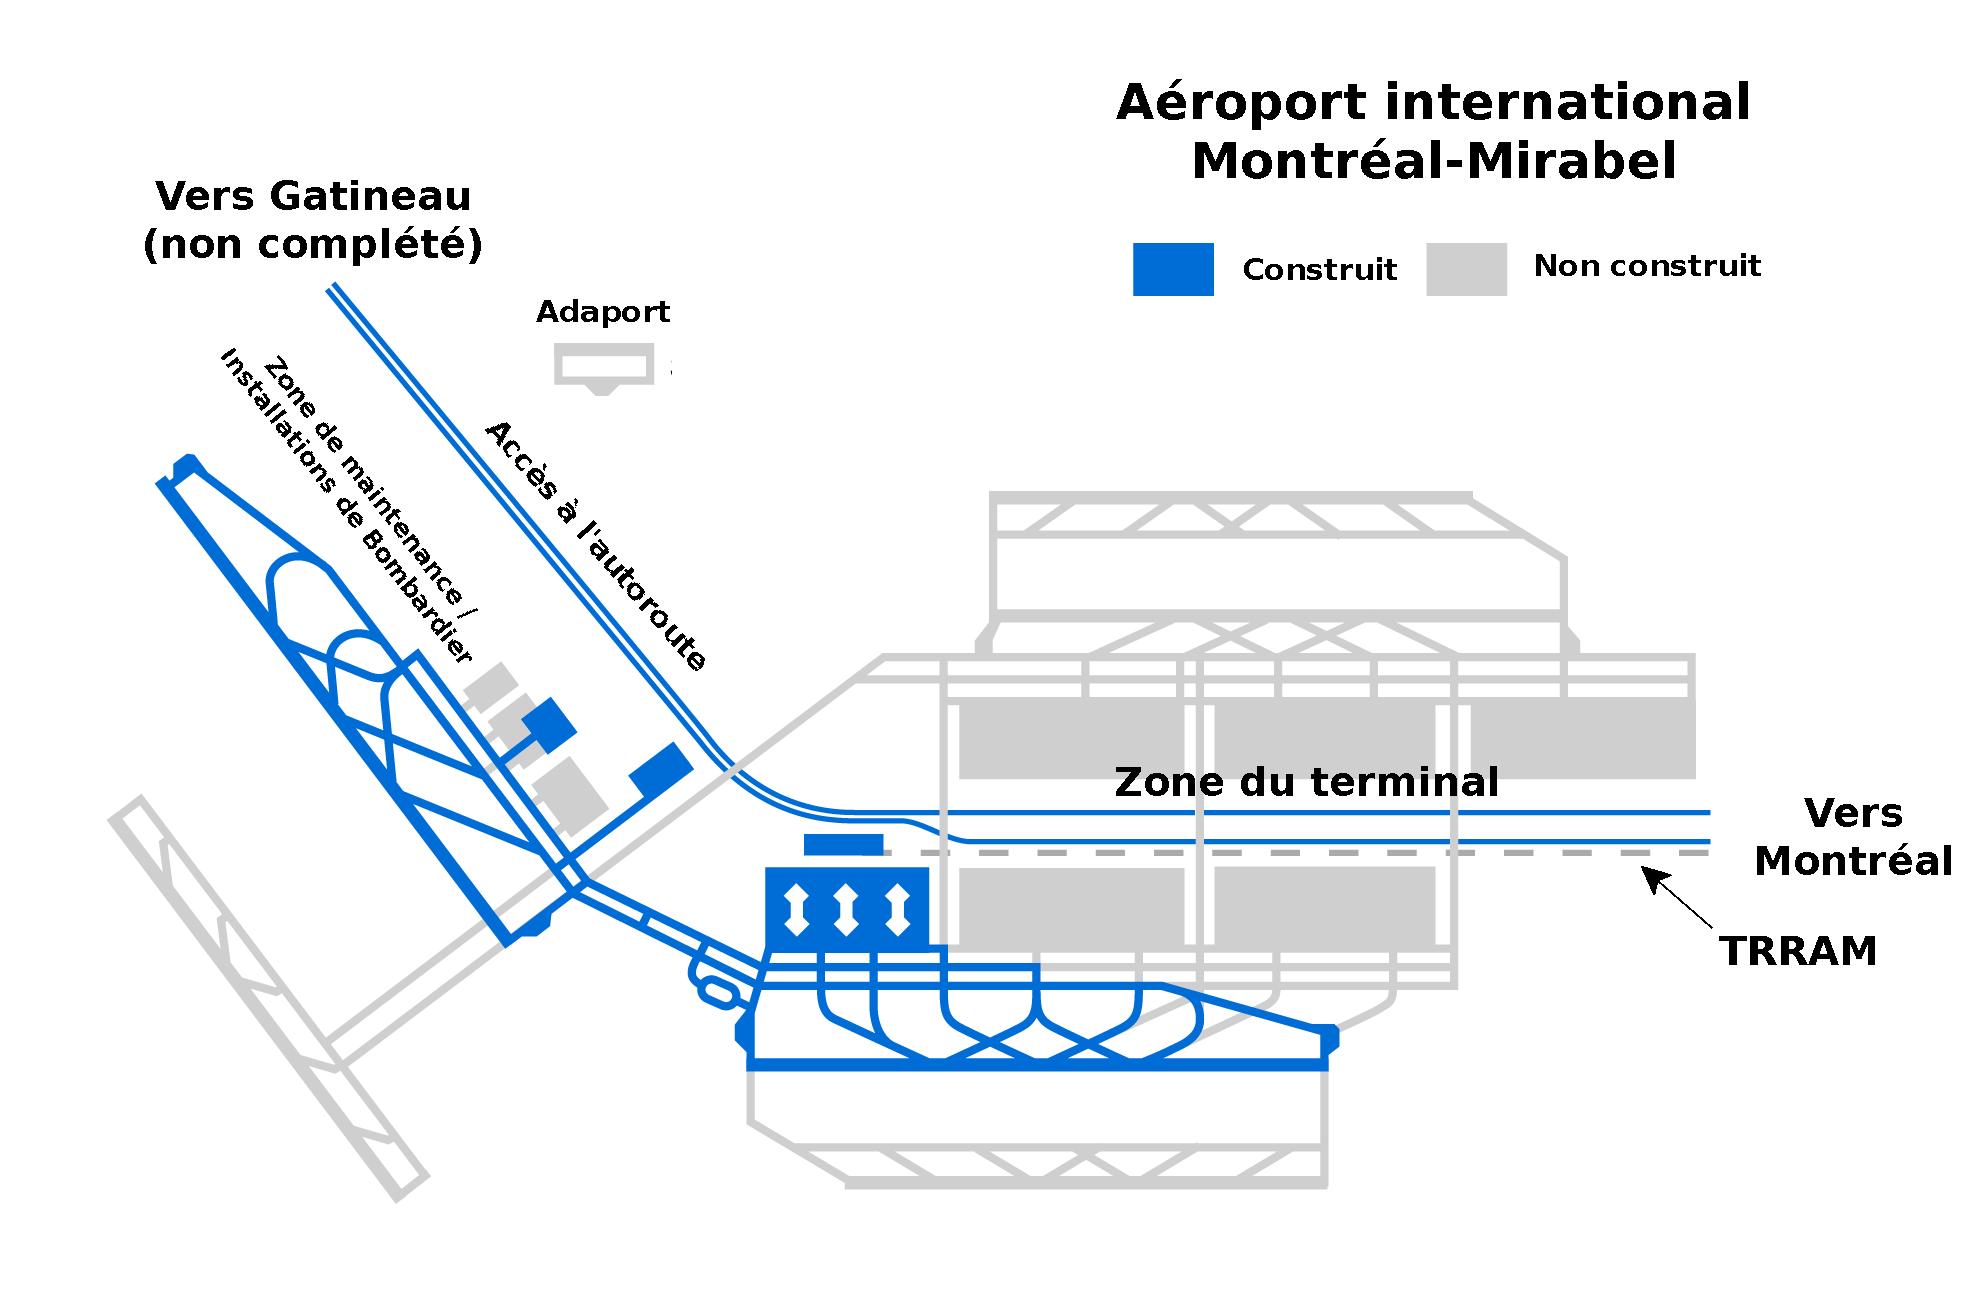 Filemirabel airport diagram frg wikimedia commons filemirabel airport diagram frg ccuart Gallery